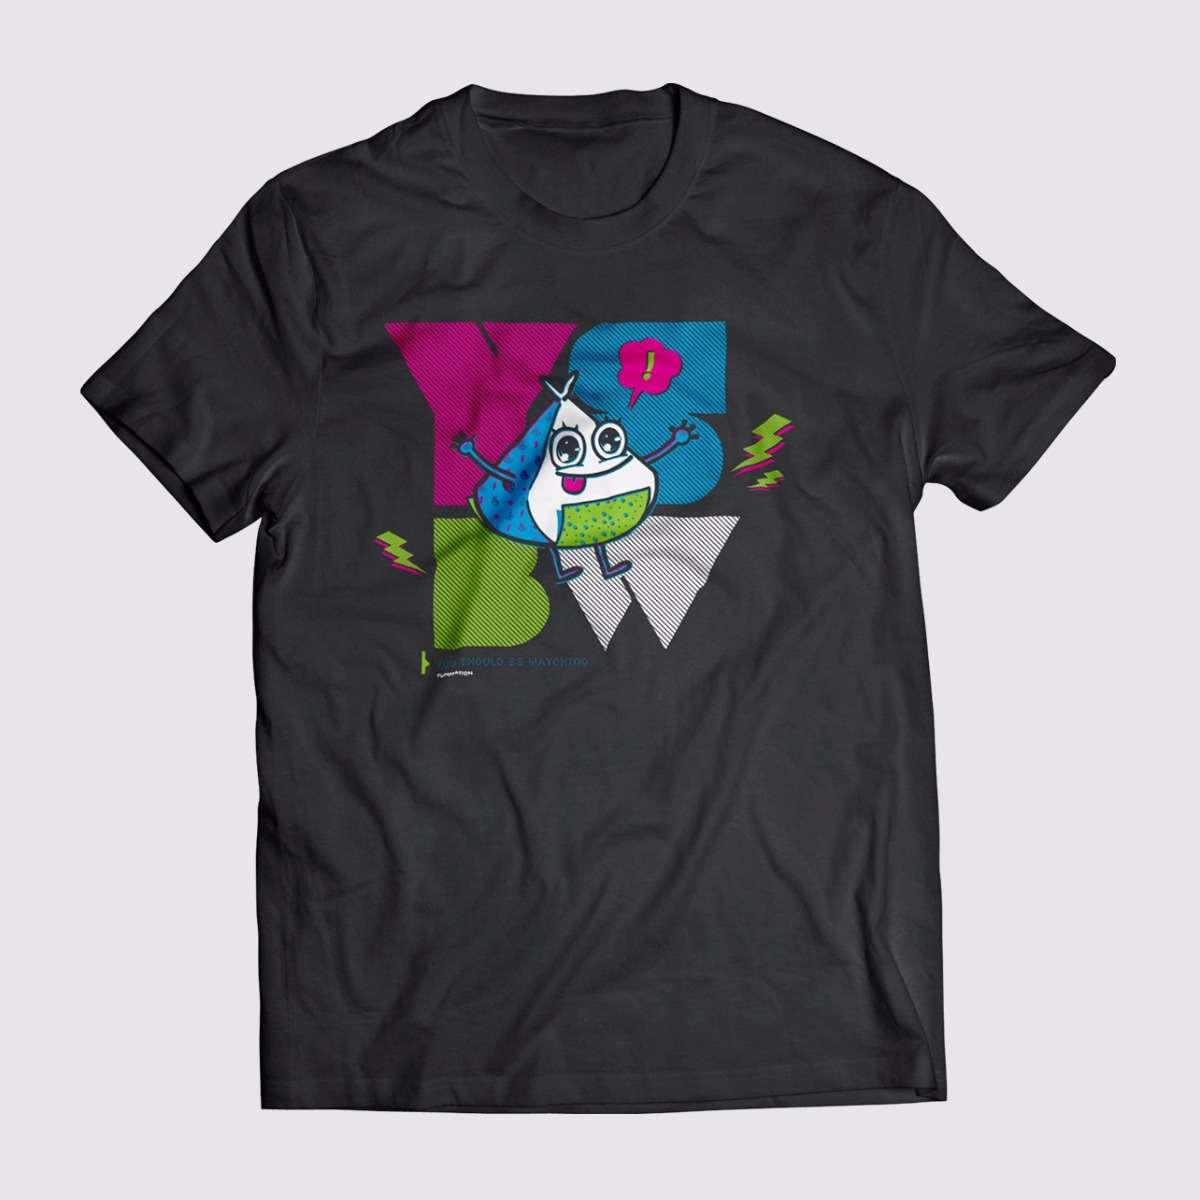 Oni-G YSBW T-Shirt apparel